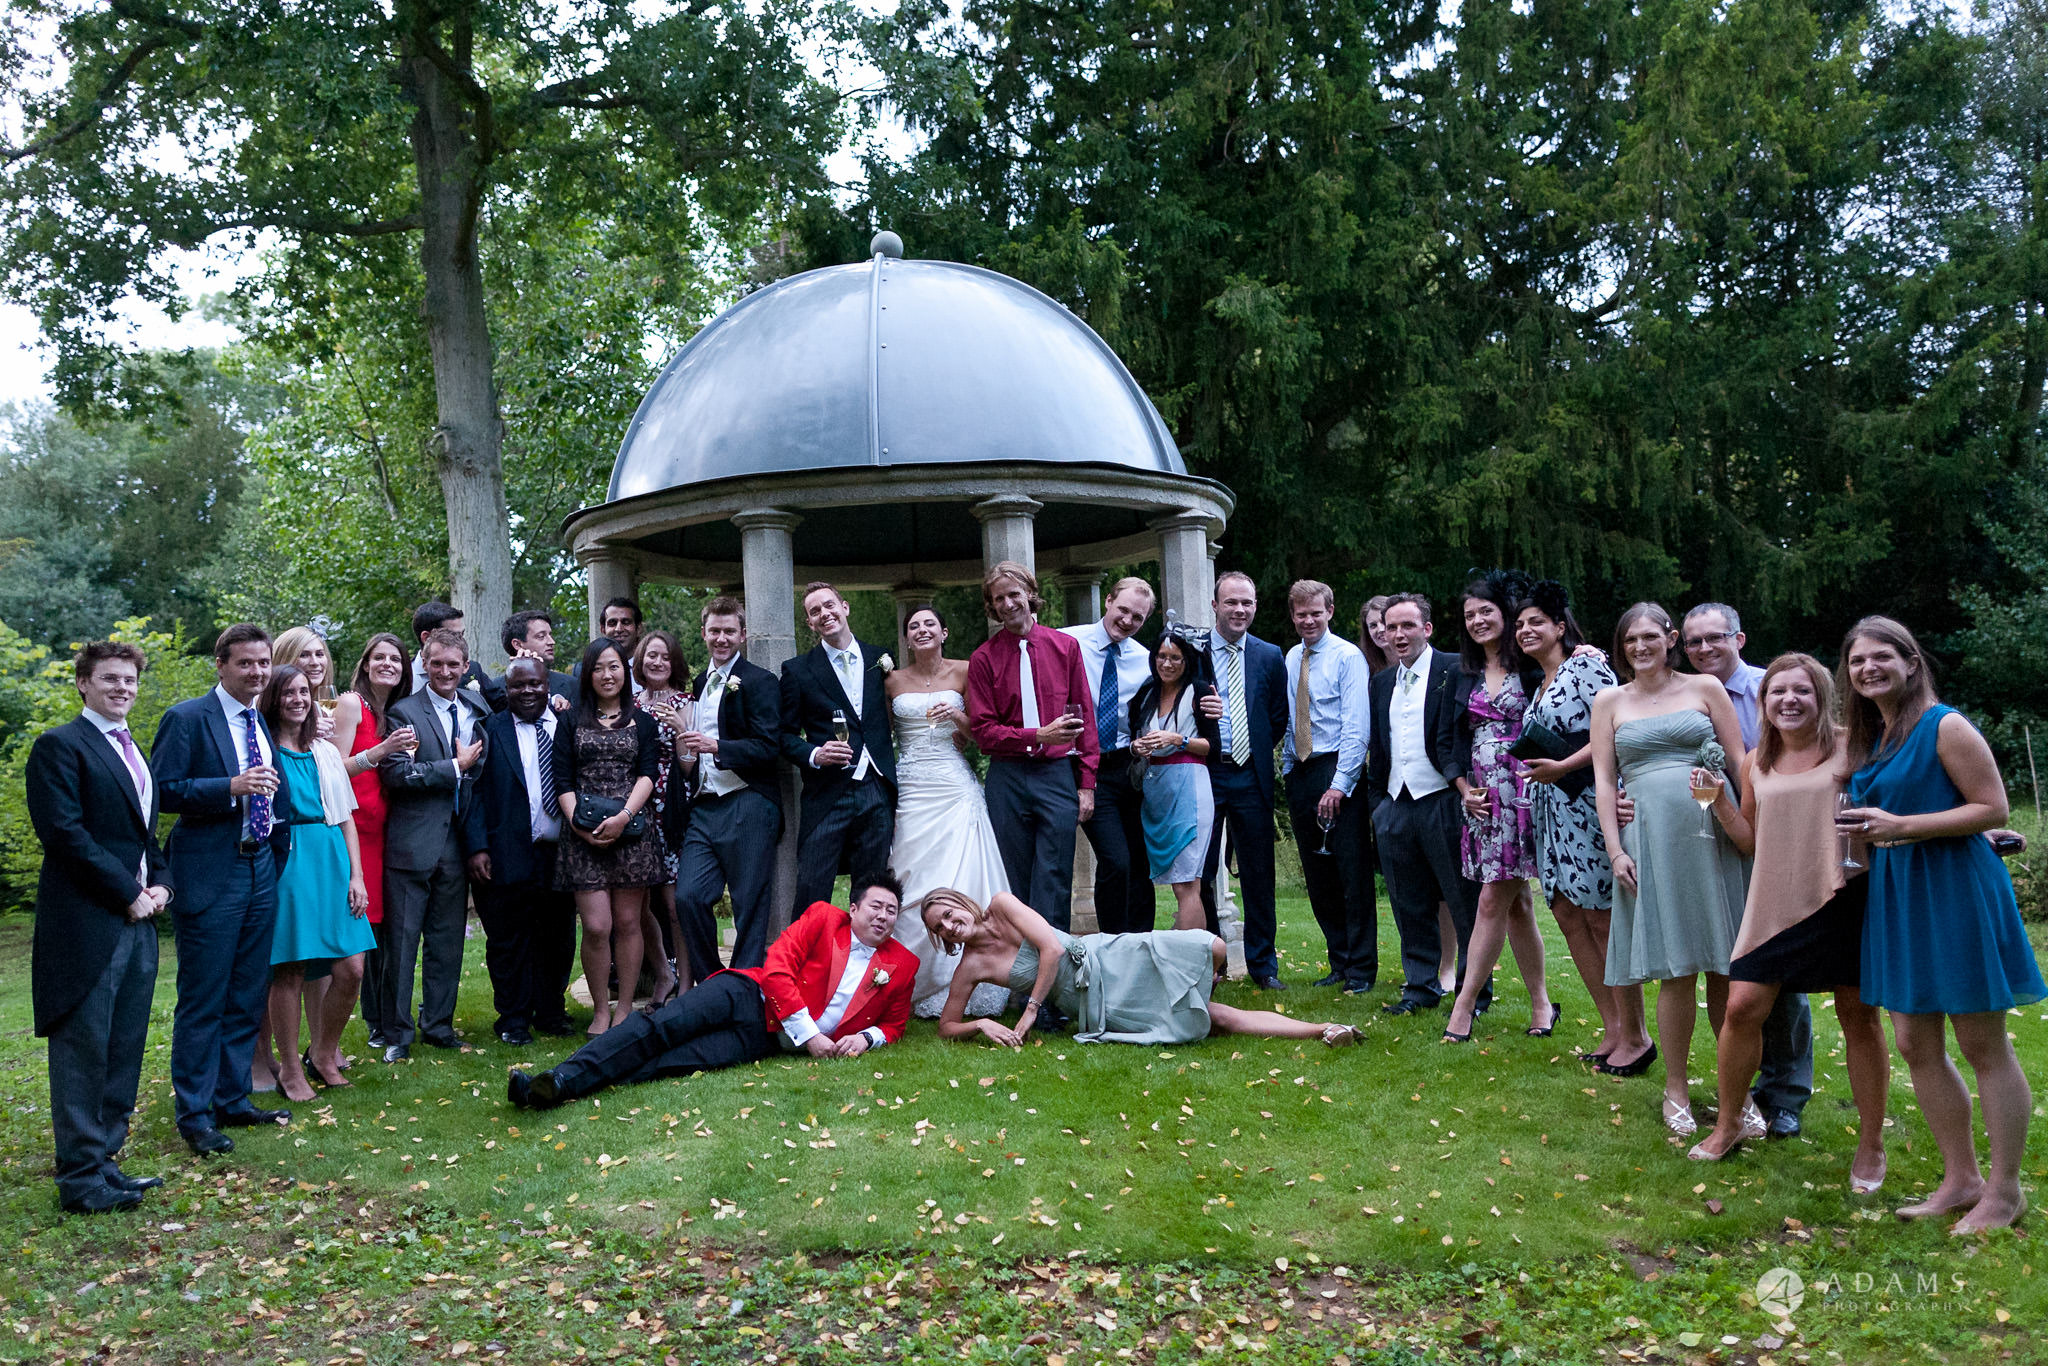 Kingston Bagpuize House wedding group photo